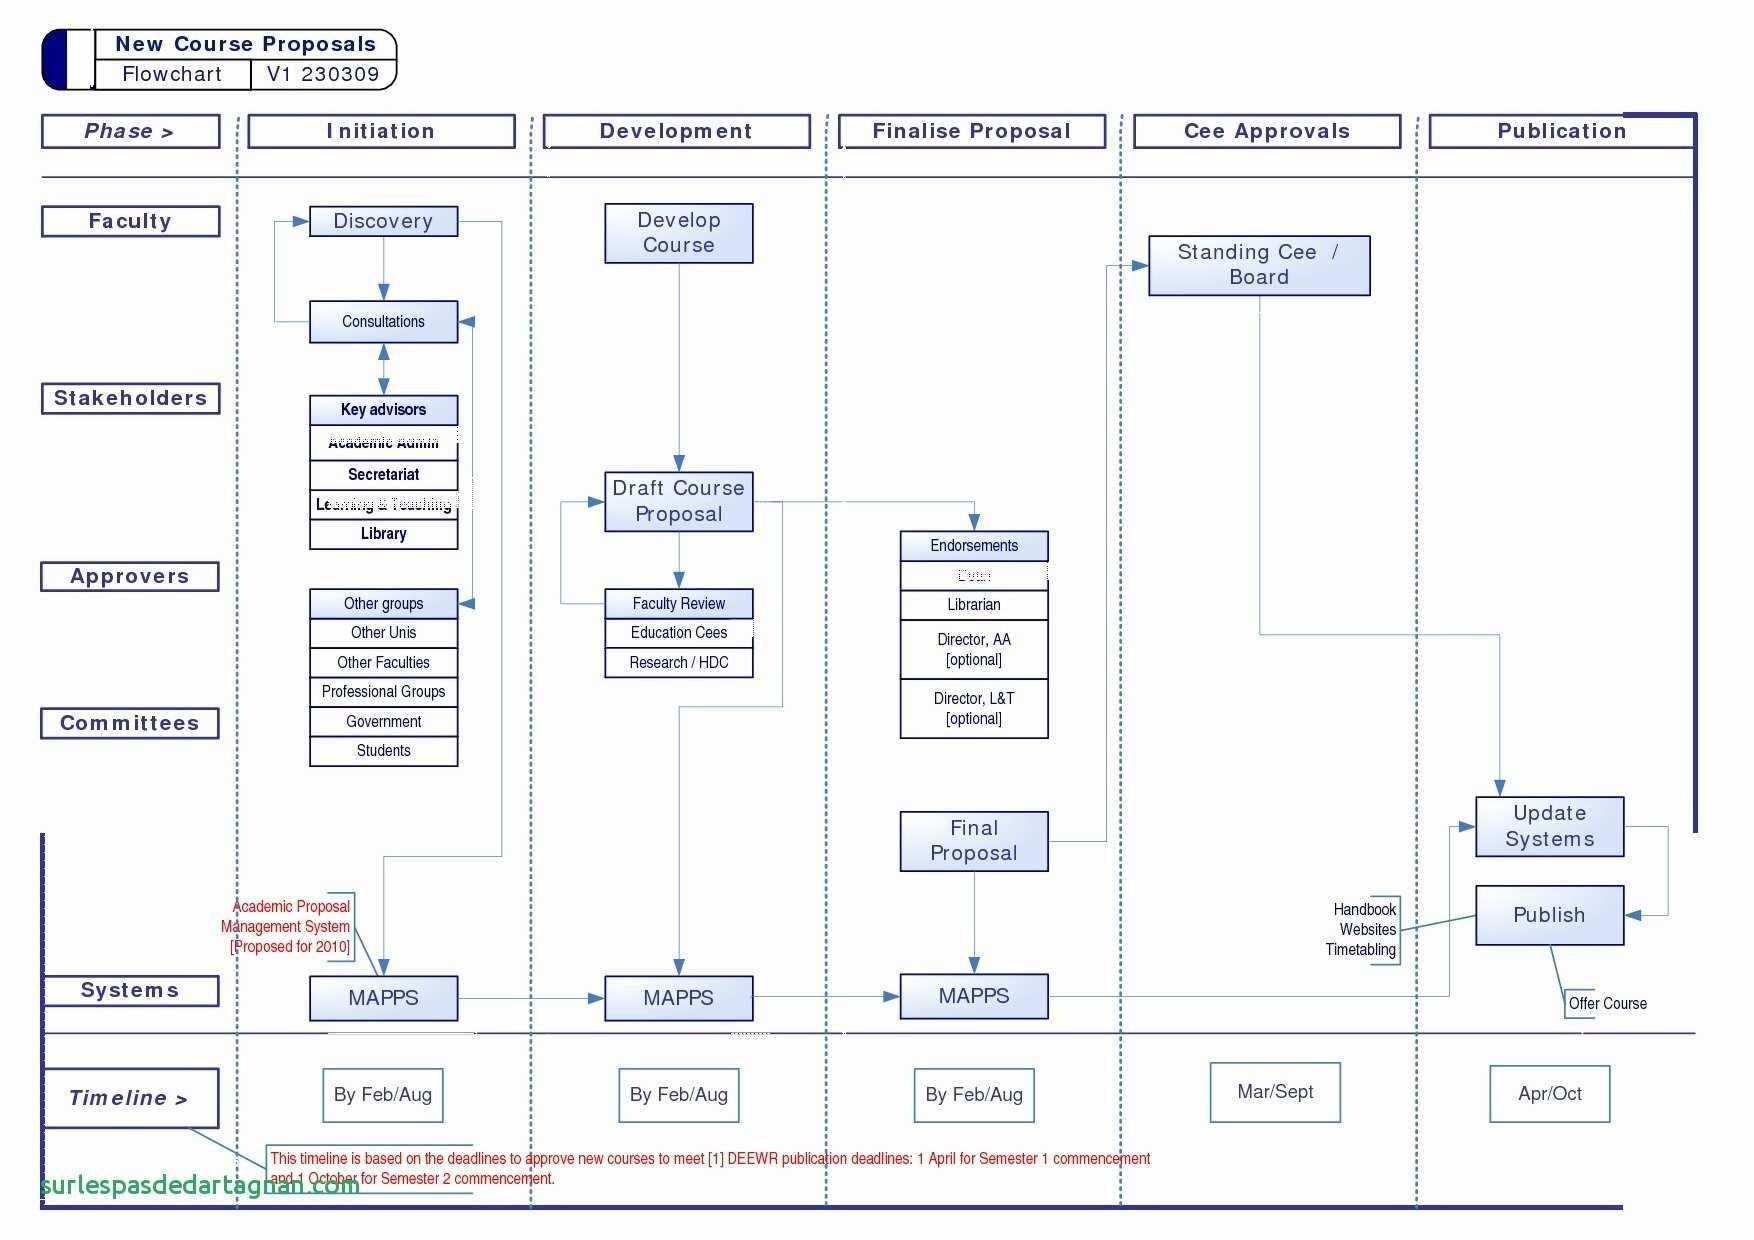 All Wheel Drive Diagram Project Schedule Gantt Chart Template ¢Ë†Å¡ Sample Flow Chart Of All Wheel Drive Diagram